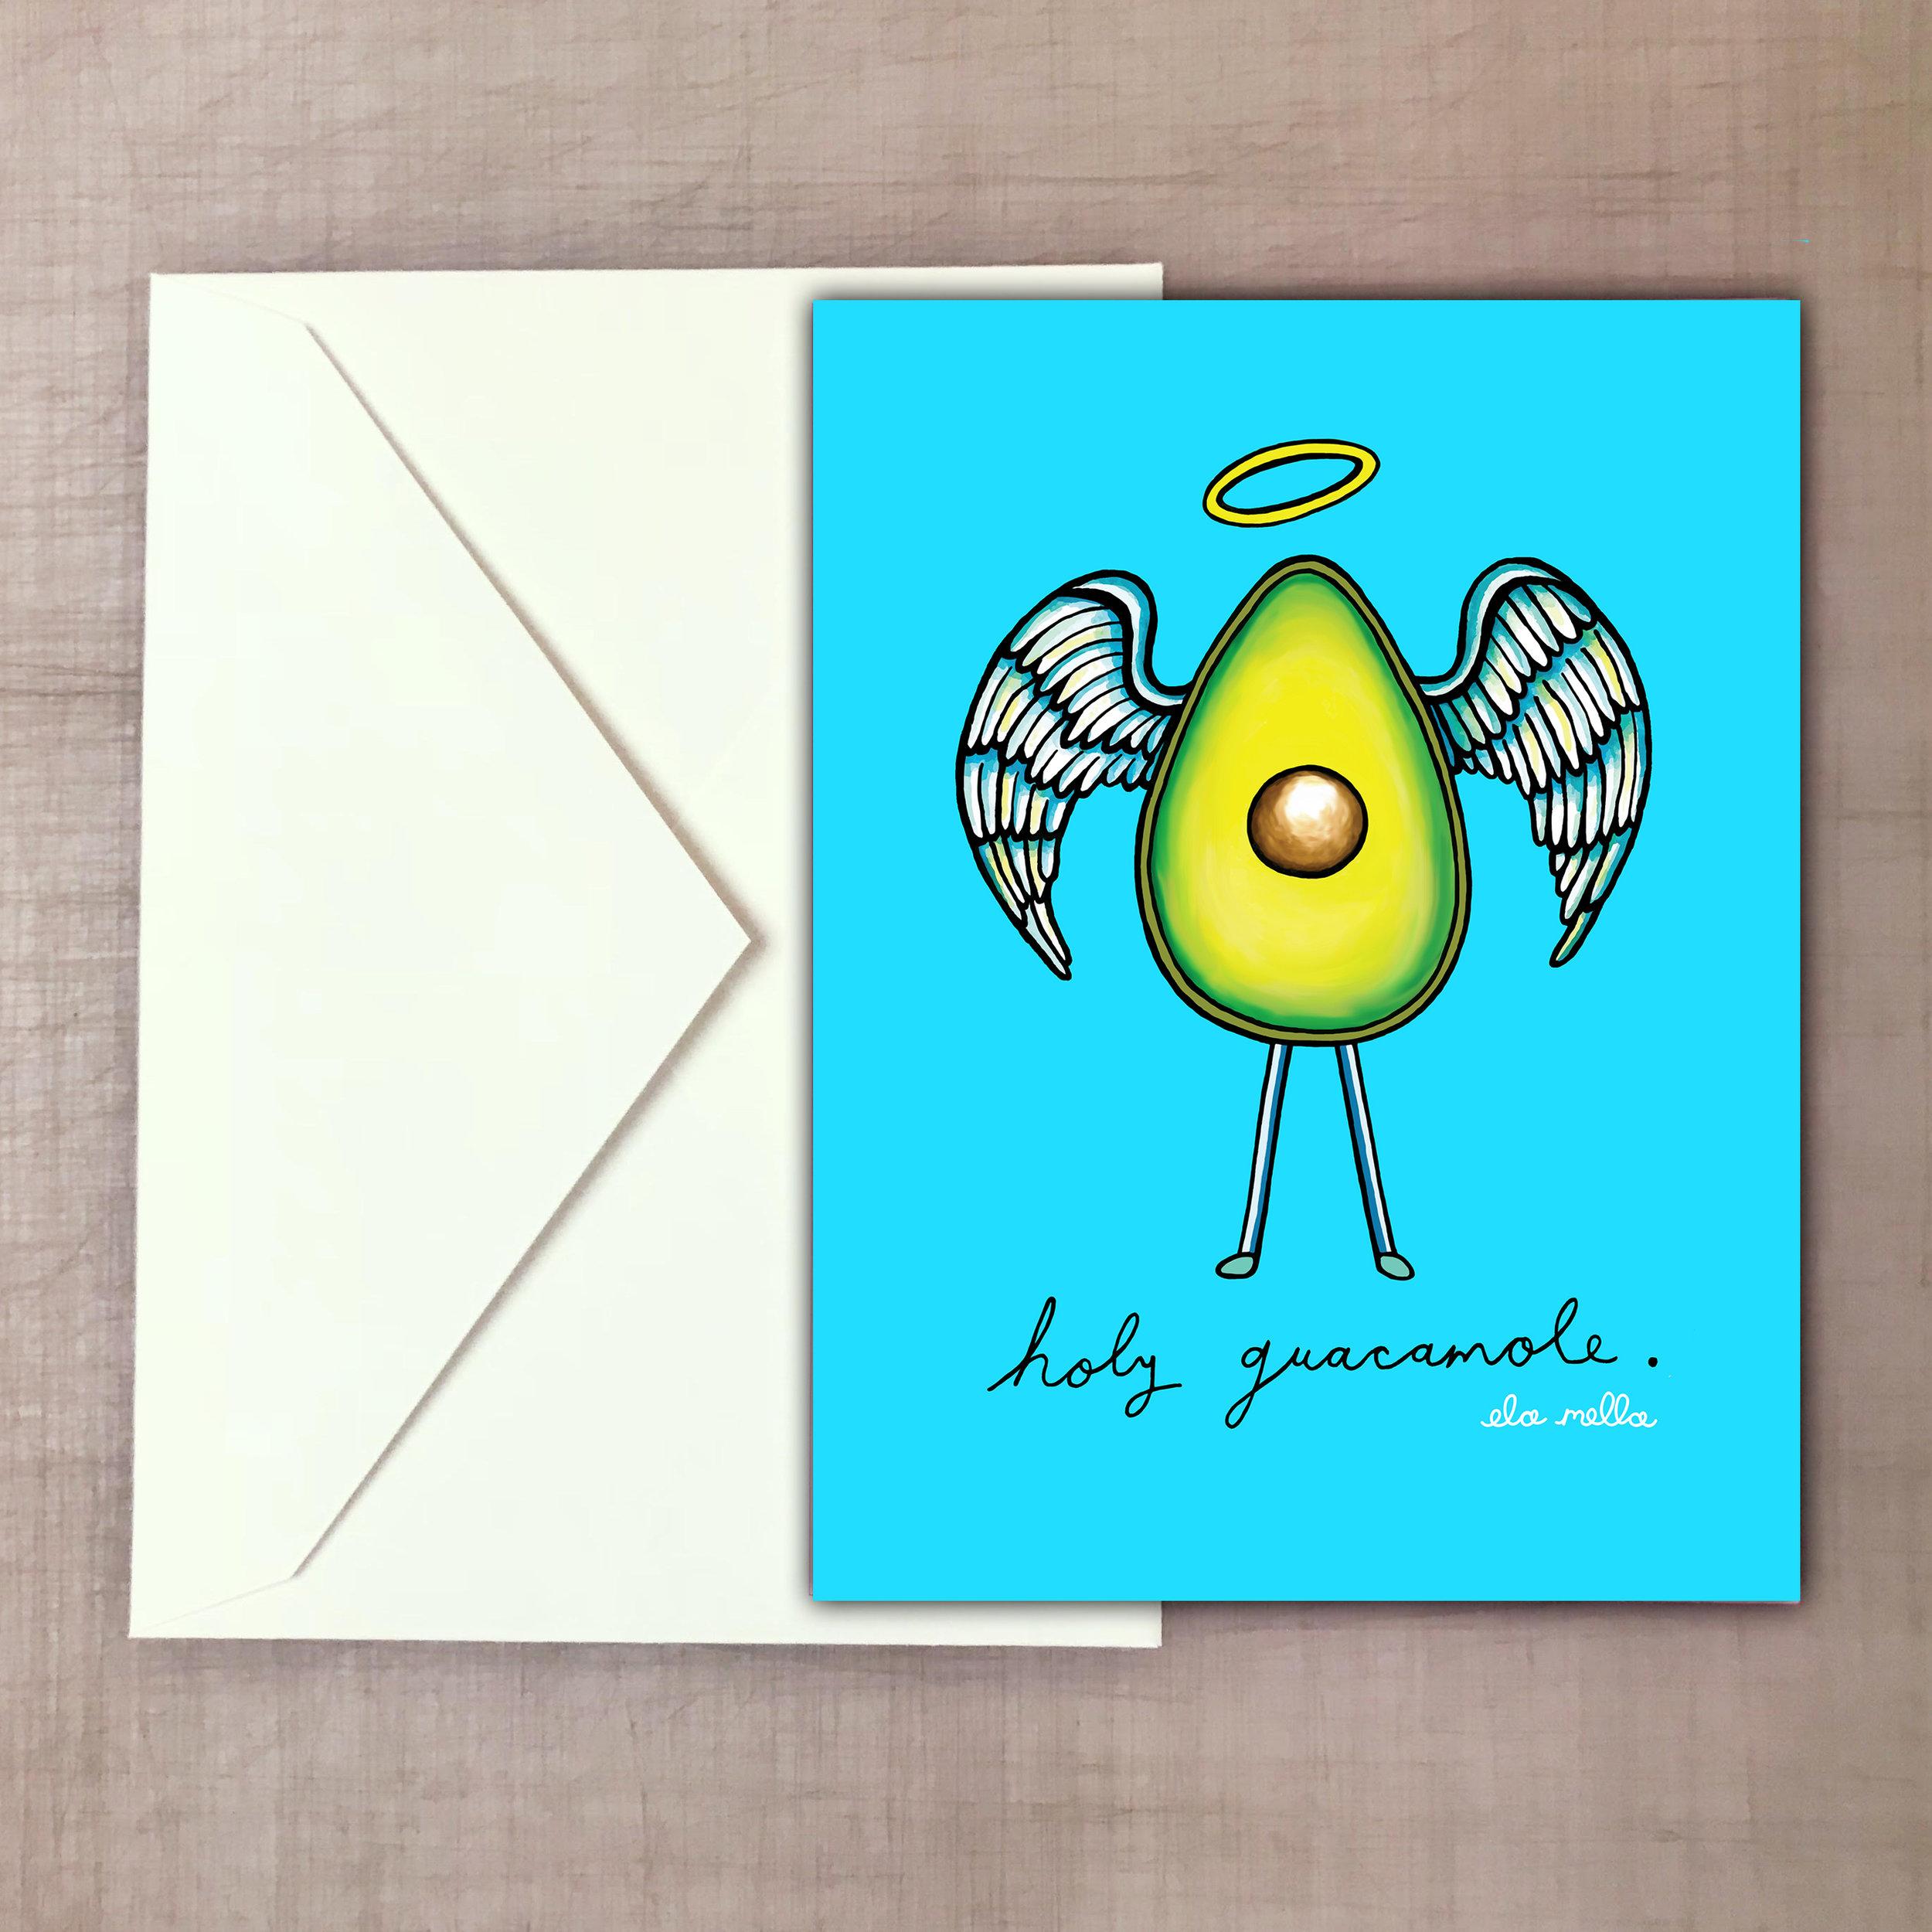 Holy Guacamole Greeting Card.jpg